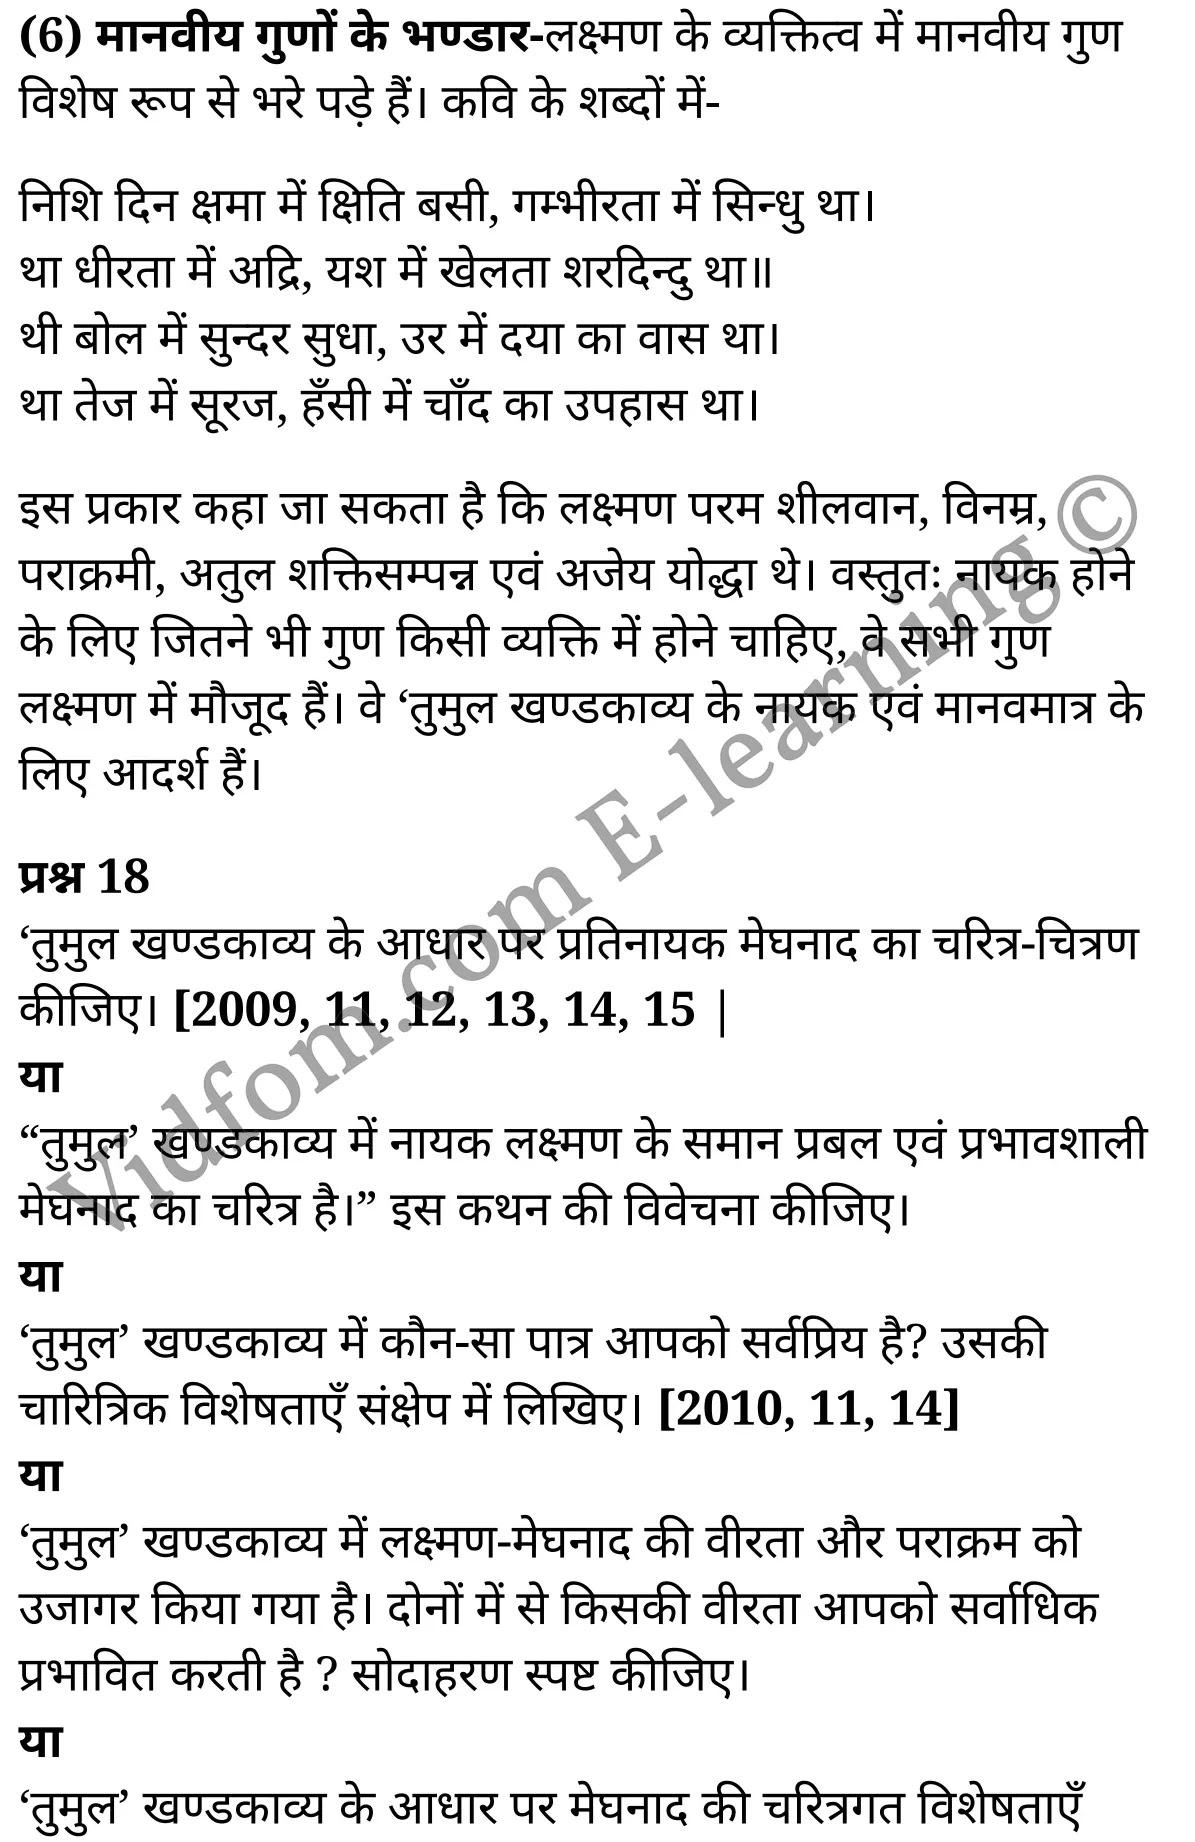 कक्षा 10 हिंदी  के नोट्स  हिंदी में एनसीईआरटी समाधान,     class 10 Hindi khand kaavya Chapter 8,   class 10 Hindi khand kaavya Chapter 8 ncert solutions in Hindi,   class 10 Hindi khand kaavya Chapter 8 notes in hindi,   class 10 Hindi khand kaavya Chapter 8 question answer,   class 10 Hindi khand kaavya Chapter 8 notes,   class 10 Hindi khand kaavya Chapter 8 class 10 Hindi khand kaavya Chapter 8 in  hindi,    class 10 Hindi khand kaavya Chapter 8 important questions in  hindi,   class 10 Hindi khand kaavya Chapter 8 notes in hindi,    class 10 Hindi khand kaavya Chapter 8 test,   class 10 Hindi khand kaavya Chapter 8 pdf,   class 10 Hindi khand kaavya Chapter 8 notes pdf,   class 10 Hindi khand kaavya Chapter 8 exercise solutions,   class 10 Hindi khand kaavya Chapter 8 notes study rankers,   class 10 Hindi khand kaavya Chapter 8 notes,    class 10 Hindi khand kaavya Chapter 8  class 10  notes pdf,   class 10 Hindi khand kaavya Chapter 8 class 10  notes  ncert,   class 10 Hindi khand kaavya Chapter 8 class 10 pdf,   class 10 Hindi khand kaavya Chapter 8  book,   class 10 Hindi khand kaavya Chapter 8 quiz class 10  ,   कक्षा 10 तुमुल,  कक्षा 10 तुमुल  के नोट्स हिंदी में,  कक्षा 10 तुमुल प्रश्न उत्तर,  कक्षा 10 तुमुल के नोट्स,  10 कक्षा तुमुल  हिंदी में, कक्षा 10 तुमुल  हिंदी में,  कक्षा 10 तुमुल  महत्वपूर्ण प्रश्न हिंदी में, कक्षा 10 हिंदी के नोट्स  हिंदी में, तुमुल हिंदी में कक्षा 10 नोट्स pdf,    तुमुल हिंदी में  कक्षा 10 नोट्स 2021 ncert,   तुमुल हिंदी  कक्षा 10 pdf,   तुमुल हिंदी में  पुस्तक,   तुमुल हिंदी में की बुक,   तुमुल हिंदी में  प्रश्नोत्तरी class 10 ,  10   वीं तुमुल  पुस्तक up board,   बिहार बोर्ड 10  पुस्तक वीं तुमुल नोट्स,    तुमुल  कक्षा 10 नोट्स 2021 ncert,   तुमुल  कक्षा 10 pdf,   तुमुल  पुस्तक,   तुमुल की बुक,   तुमुल प्रश्नोत्तरी class 10,   10  th class 10 Hindi khand kaavya Chapter 8  book up board,   up board 10  th class 10 Hindi khand kaavya Chapter 8 notes,  class 10 Hindi,   class 10 Hindi ncert solutions in Hindi,   class 10 Hindi notes